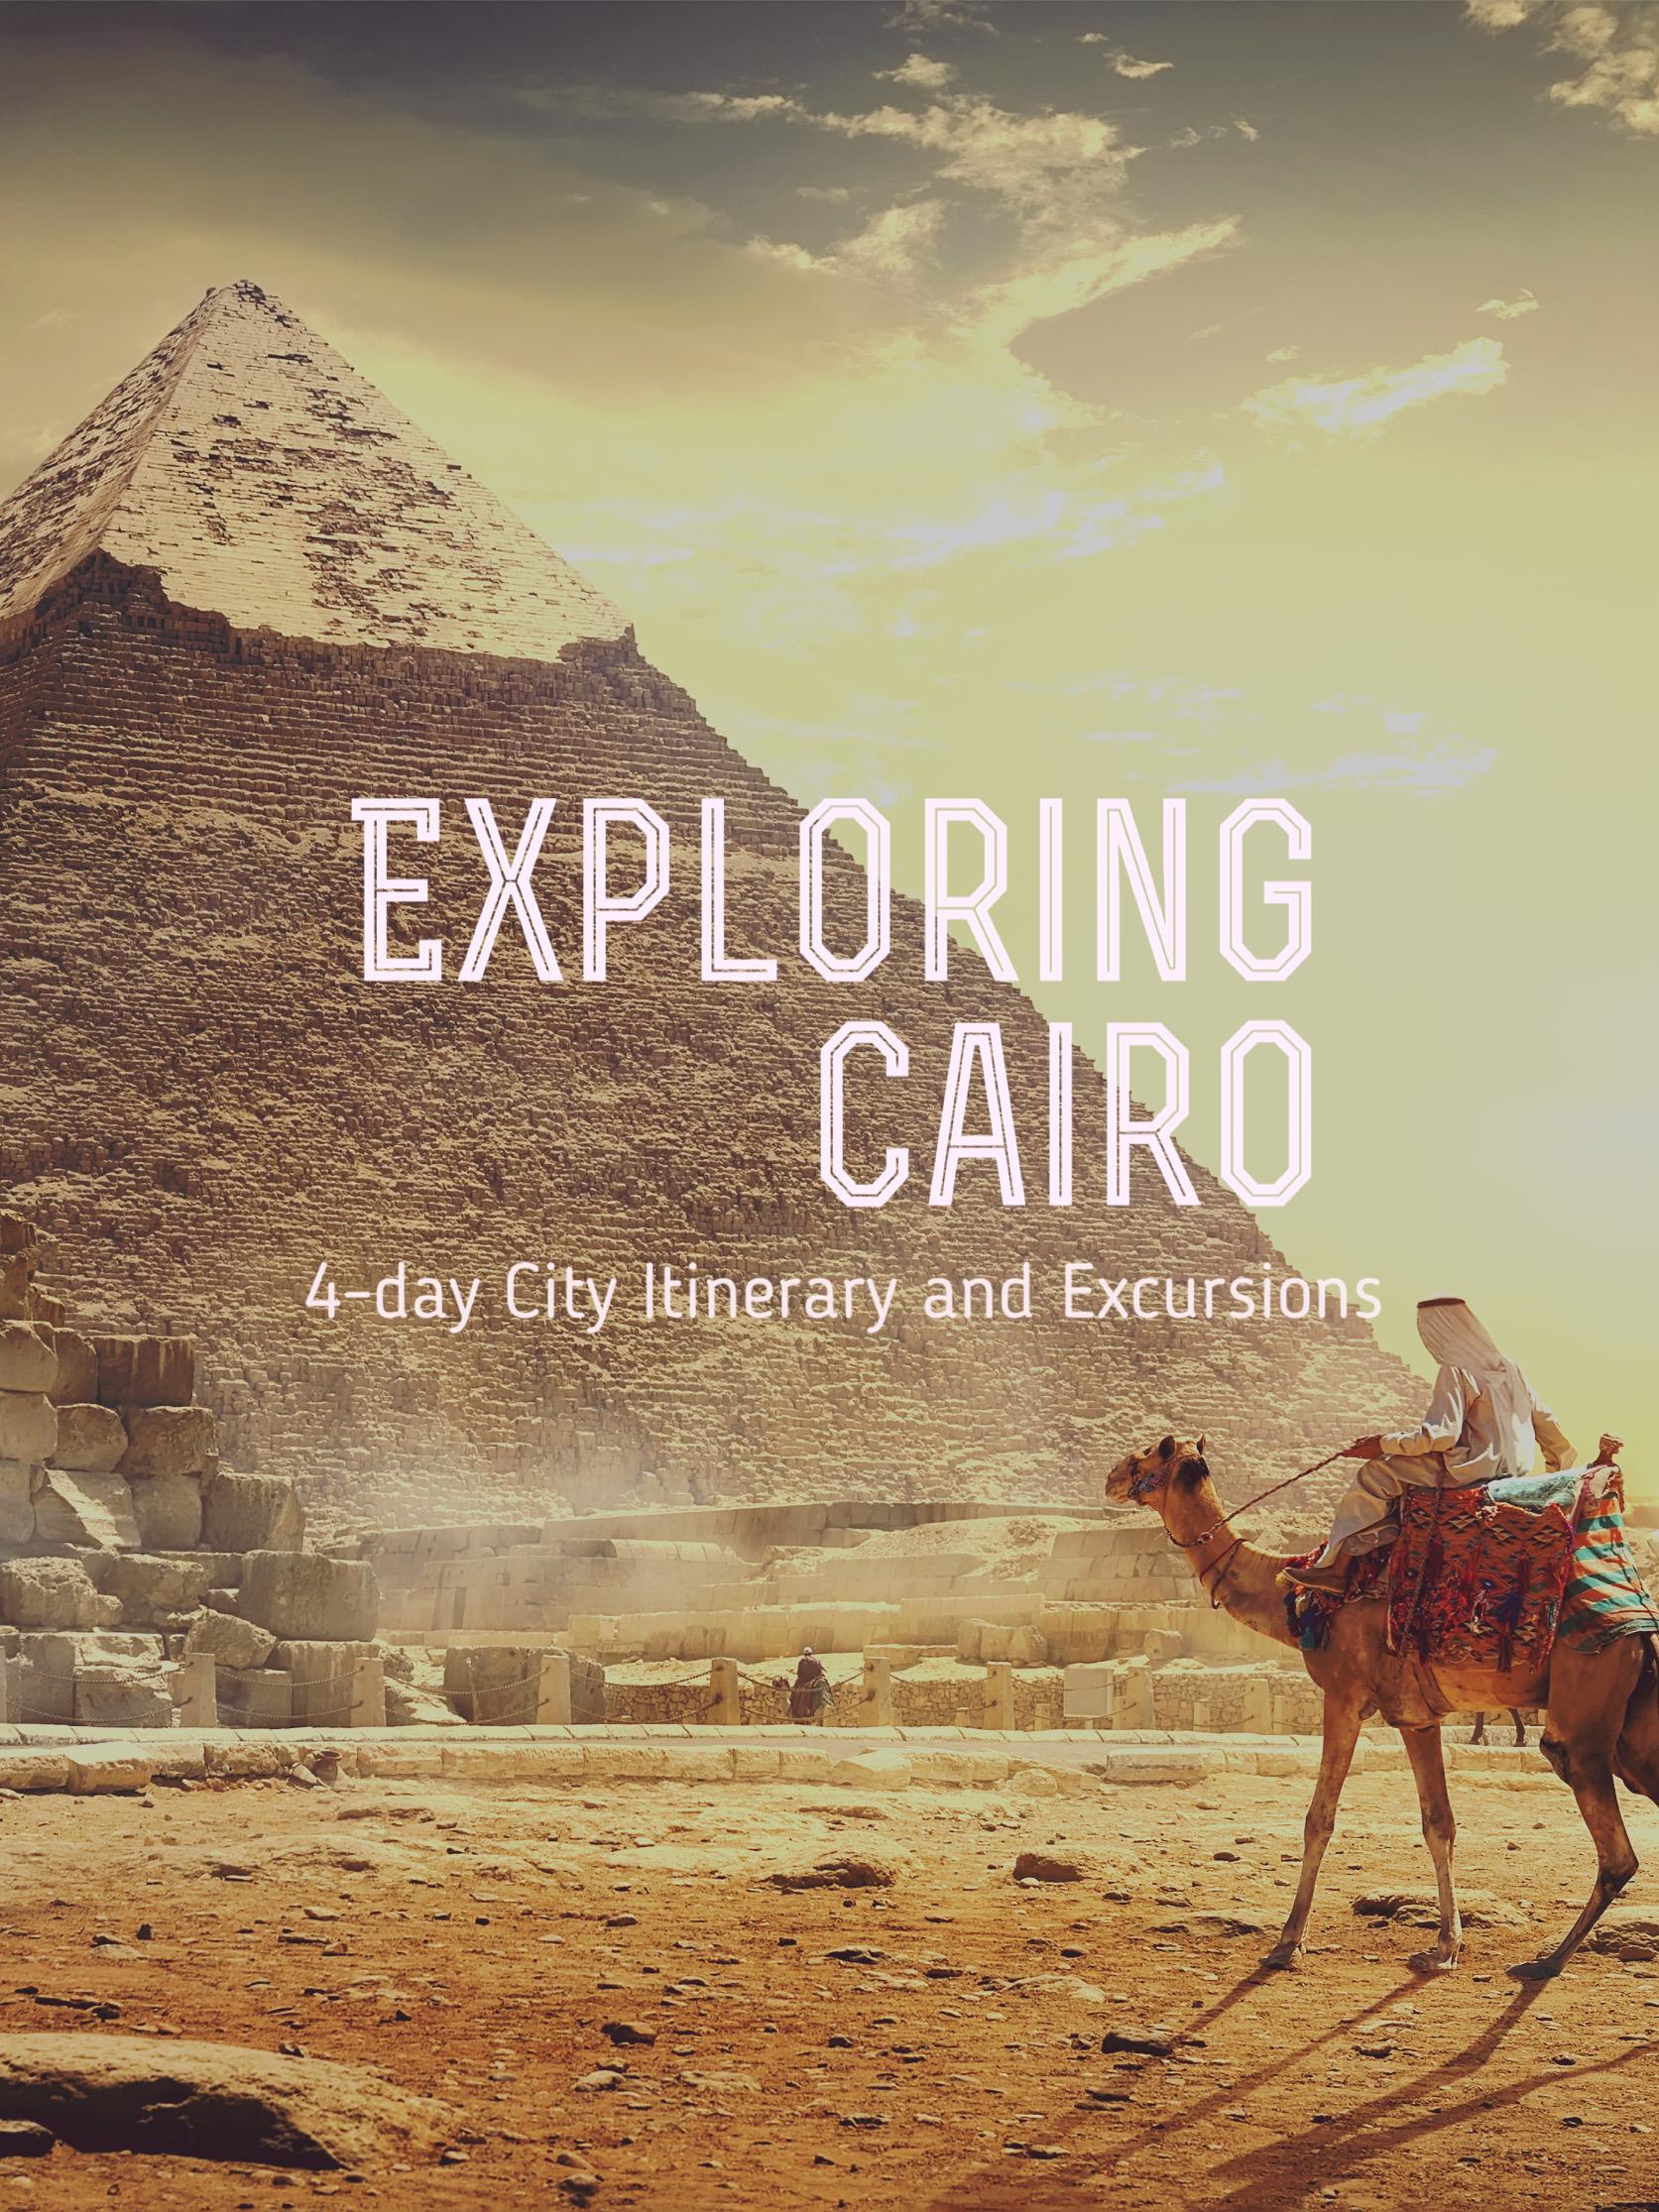 Exploring Cairo: 4-day Itinerary and City Walk